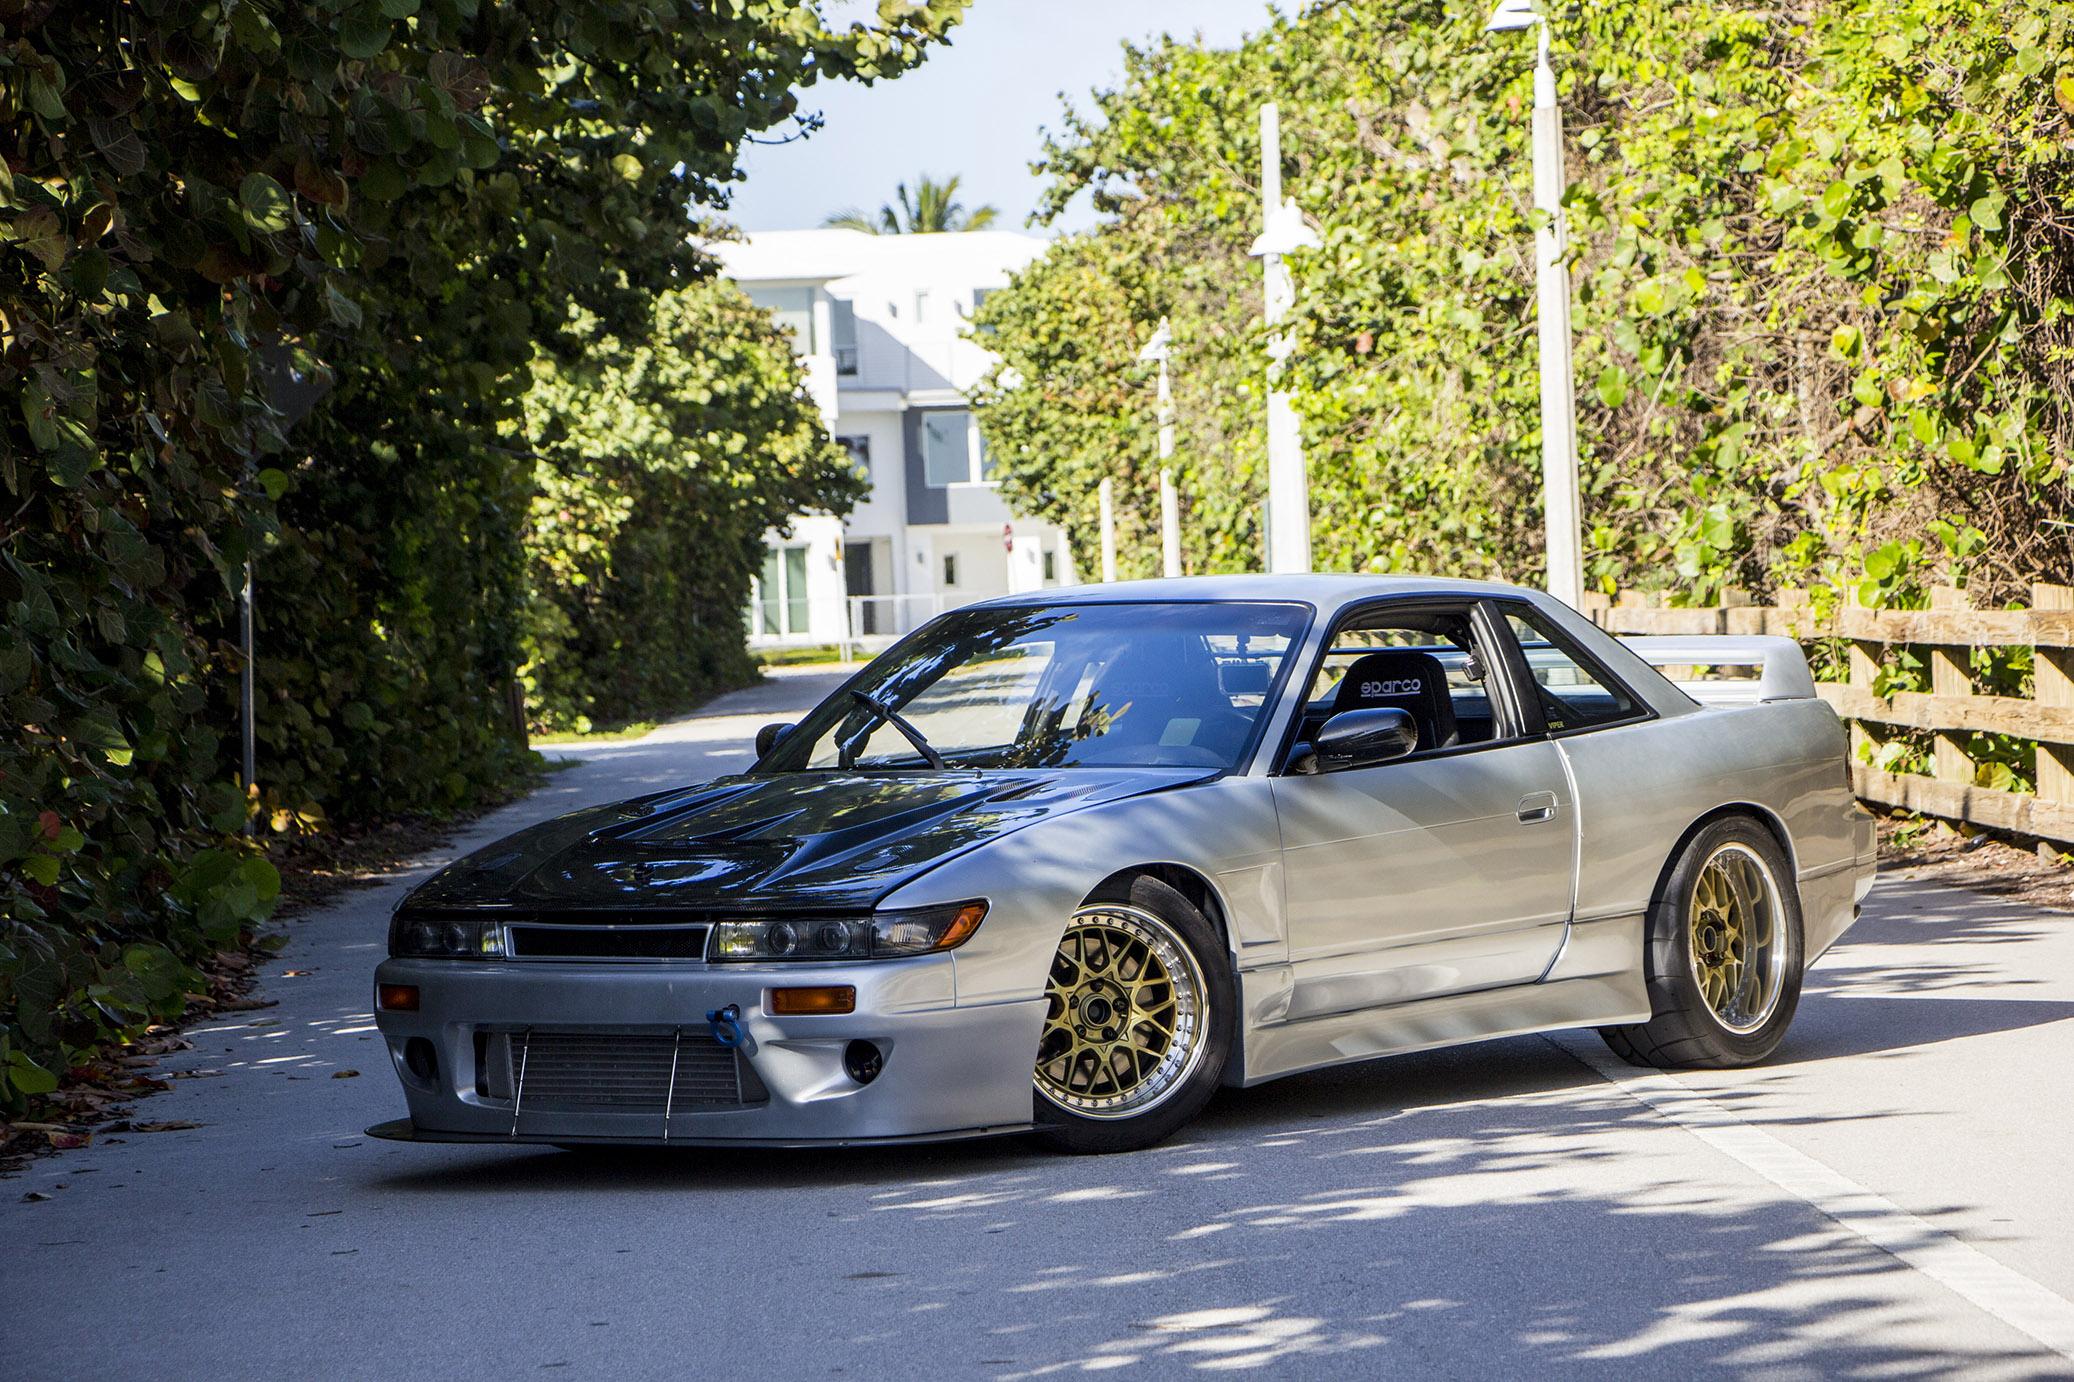 Throtl 1992 Widebody Nissan Silvia S13 Grip Race Spec 400rwhp 240sx Fuel Filter